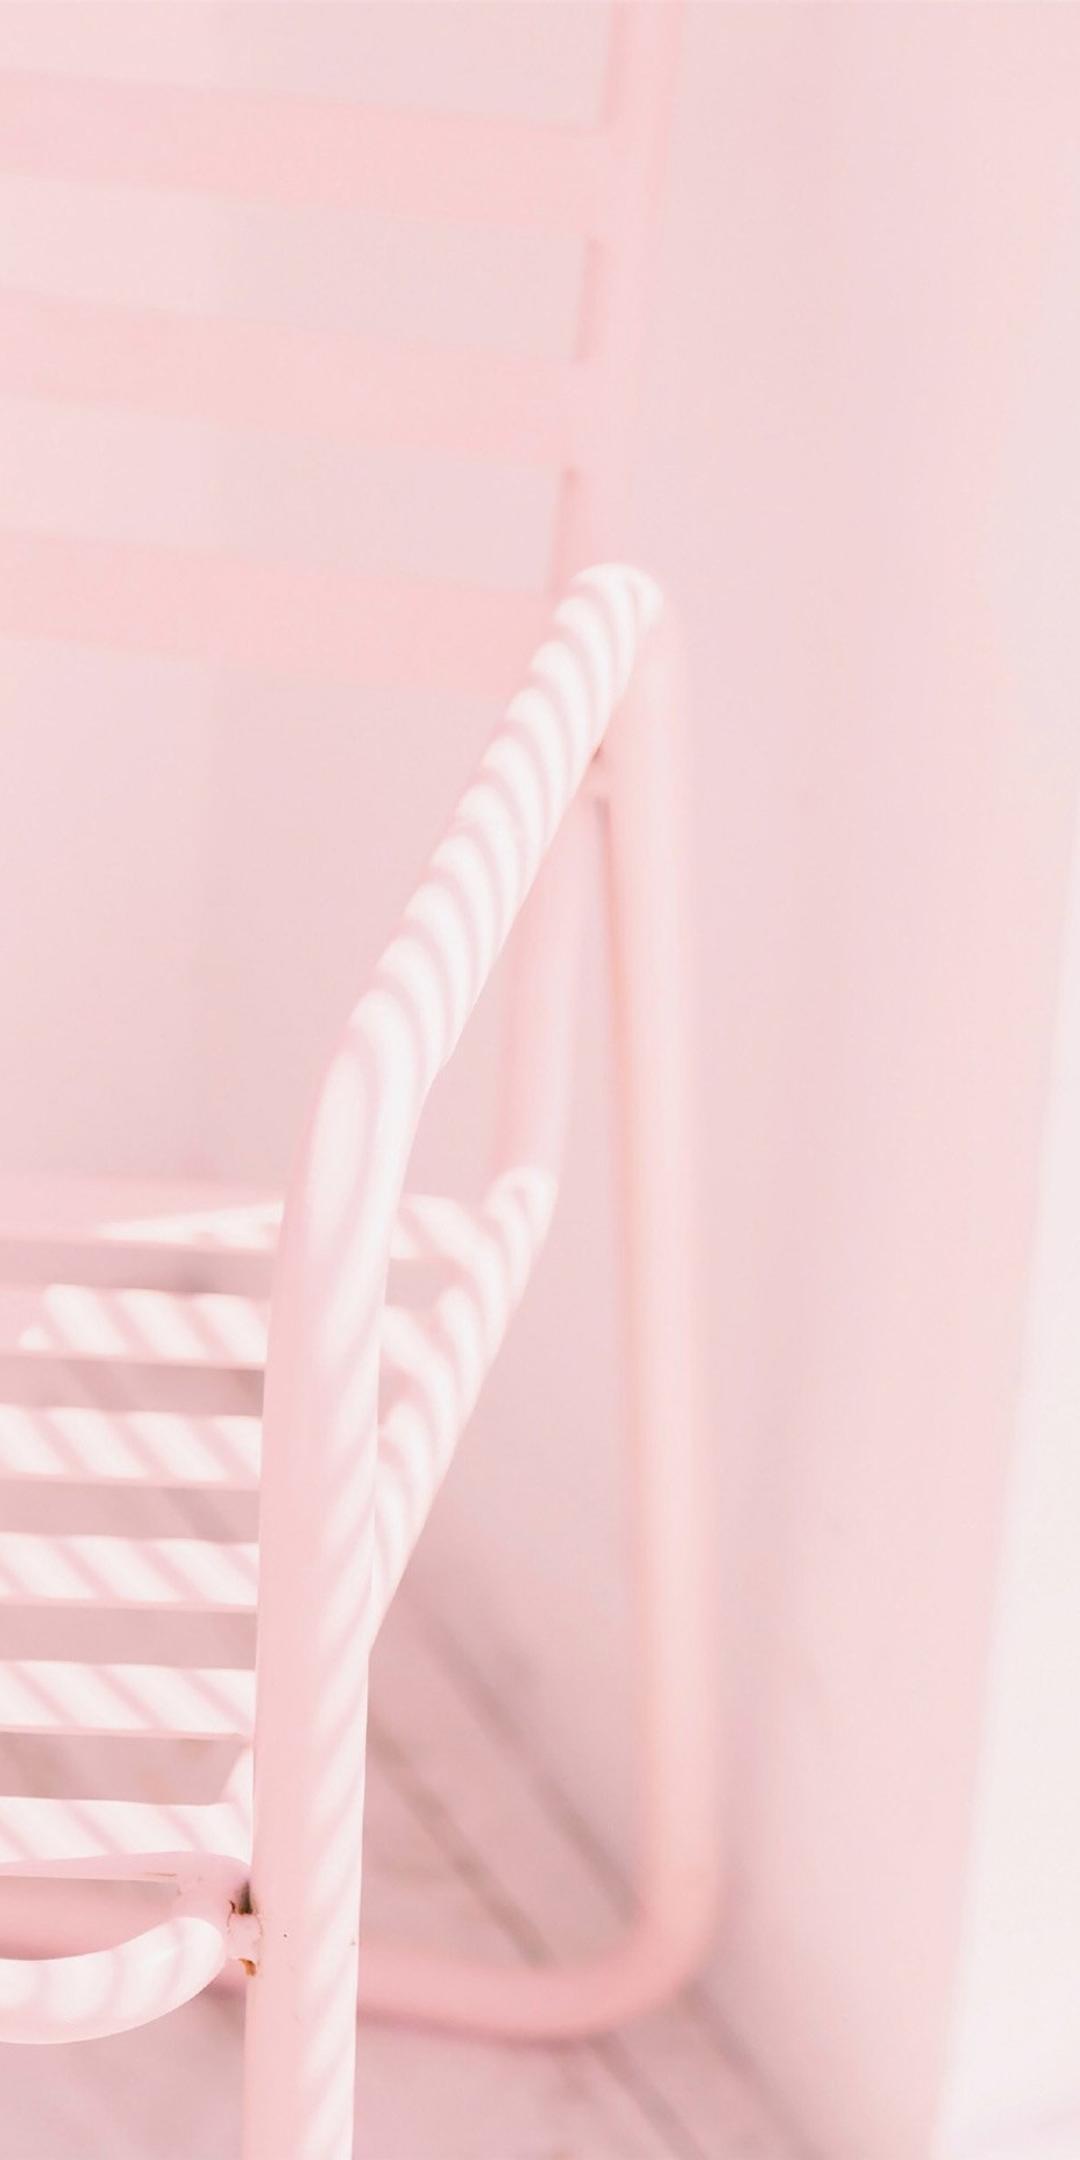 5e67b890c9c50 - 粉色系少女心手机壁纸